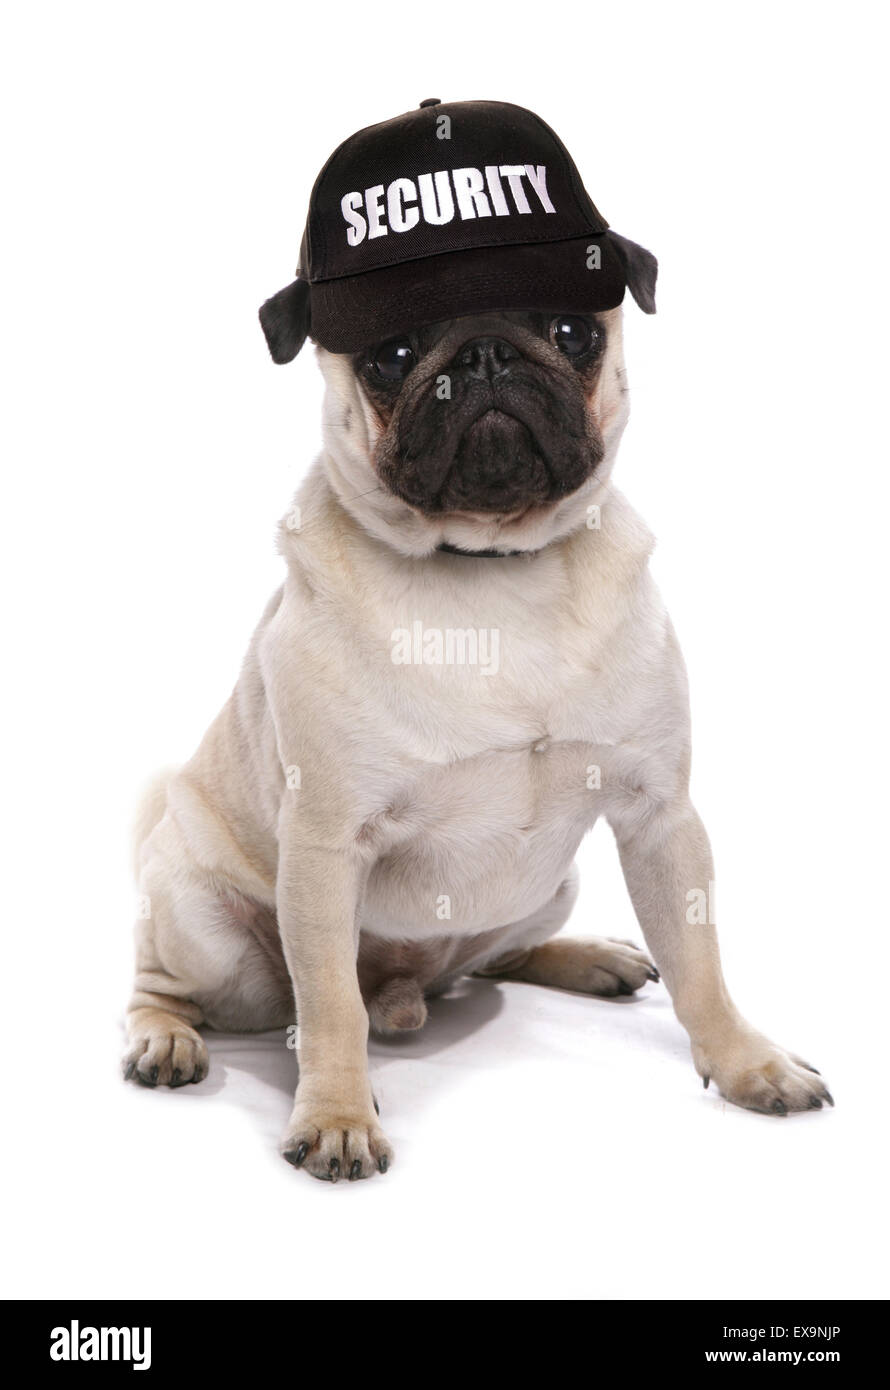 guard dog pug studio cutout - Stock Image